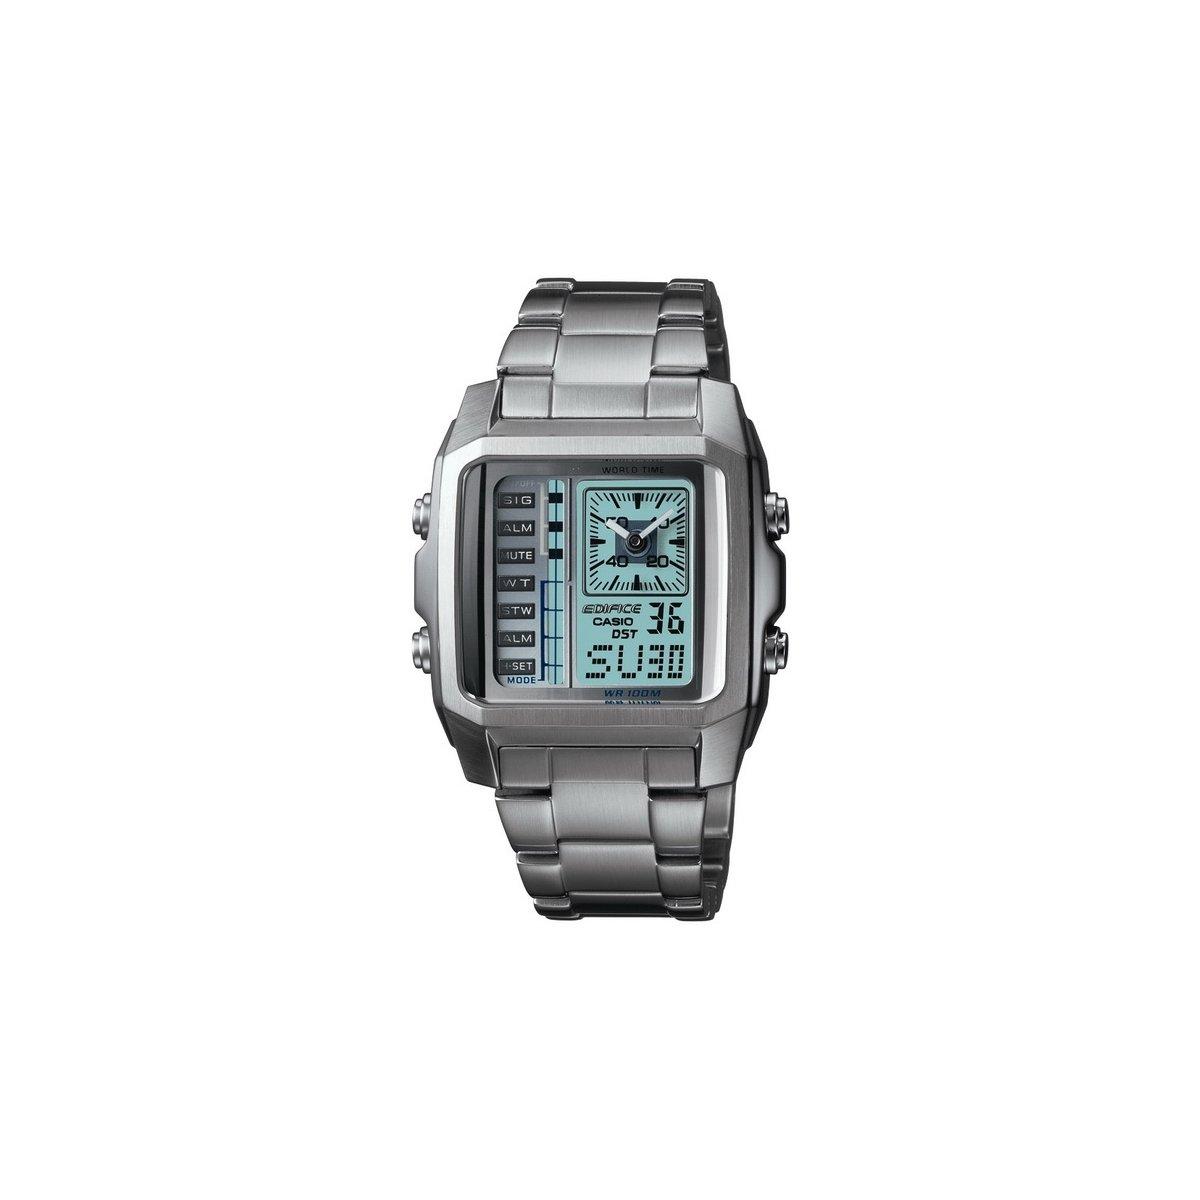 Reloj casio edifice efa-124d-7a cronografo multi - cristal anti scratch - hora mundial